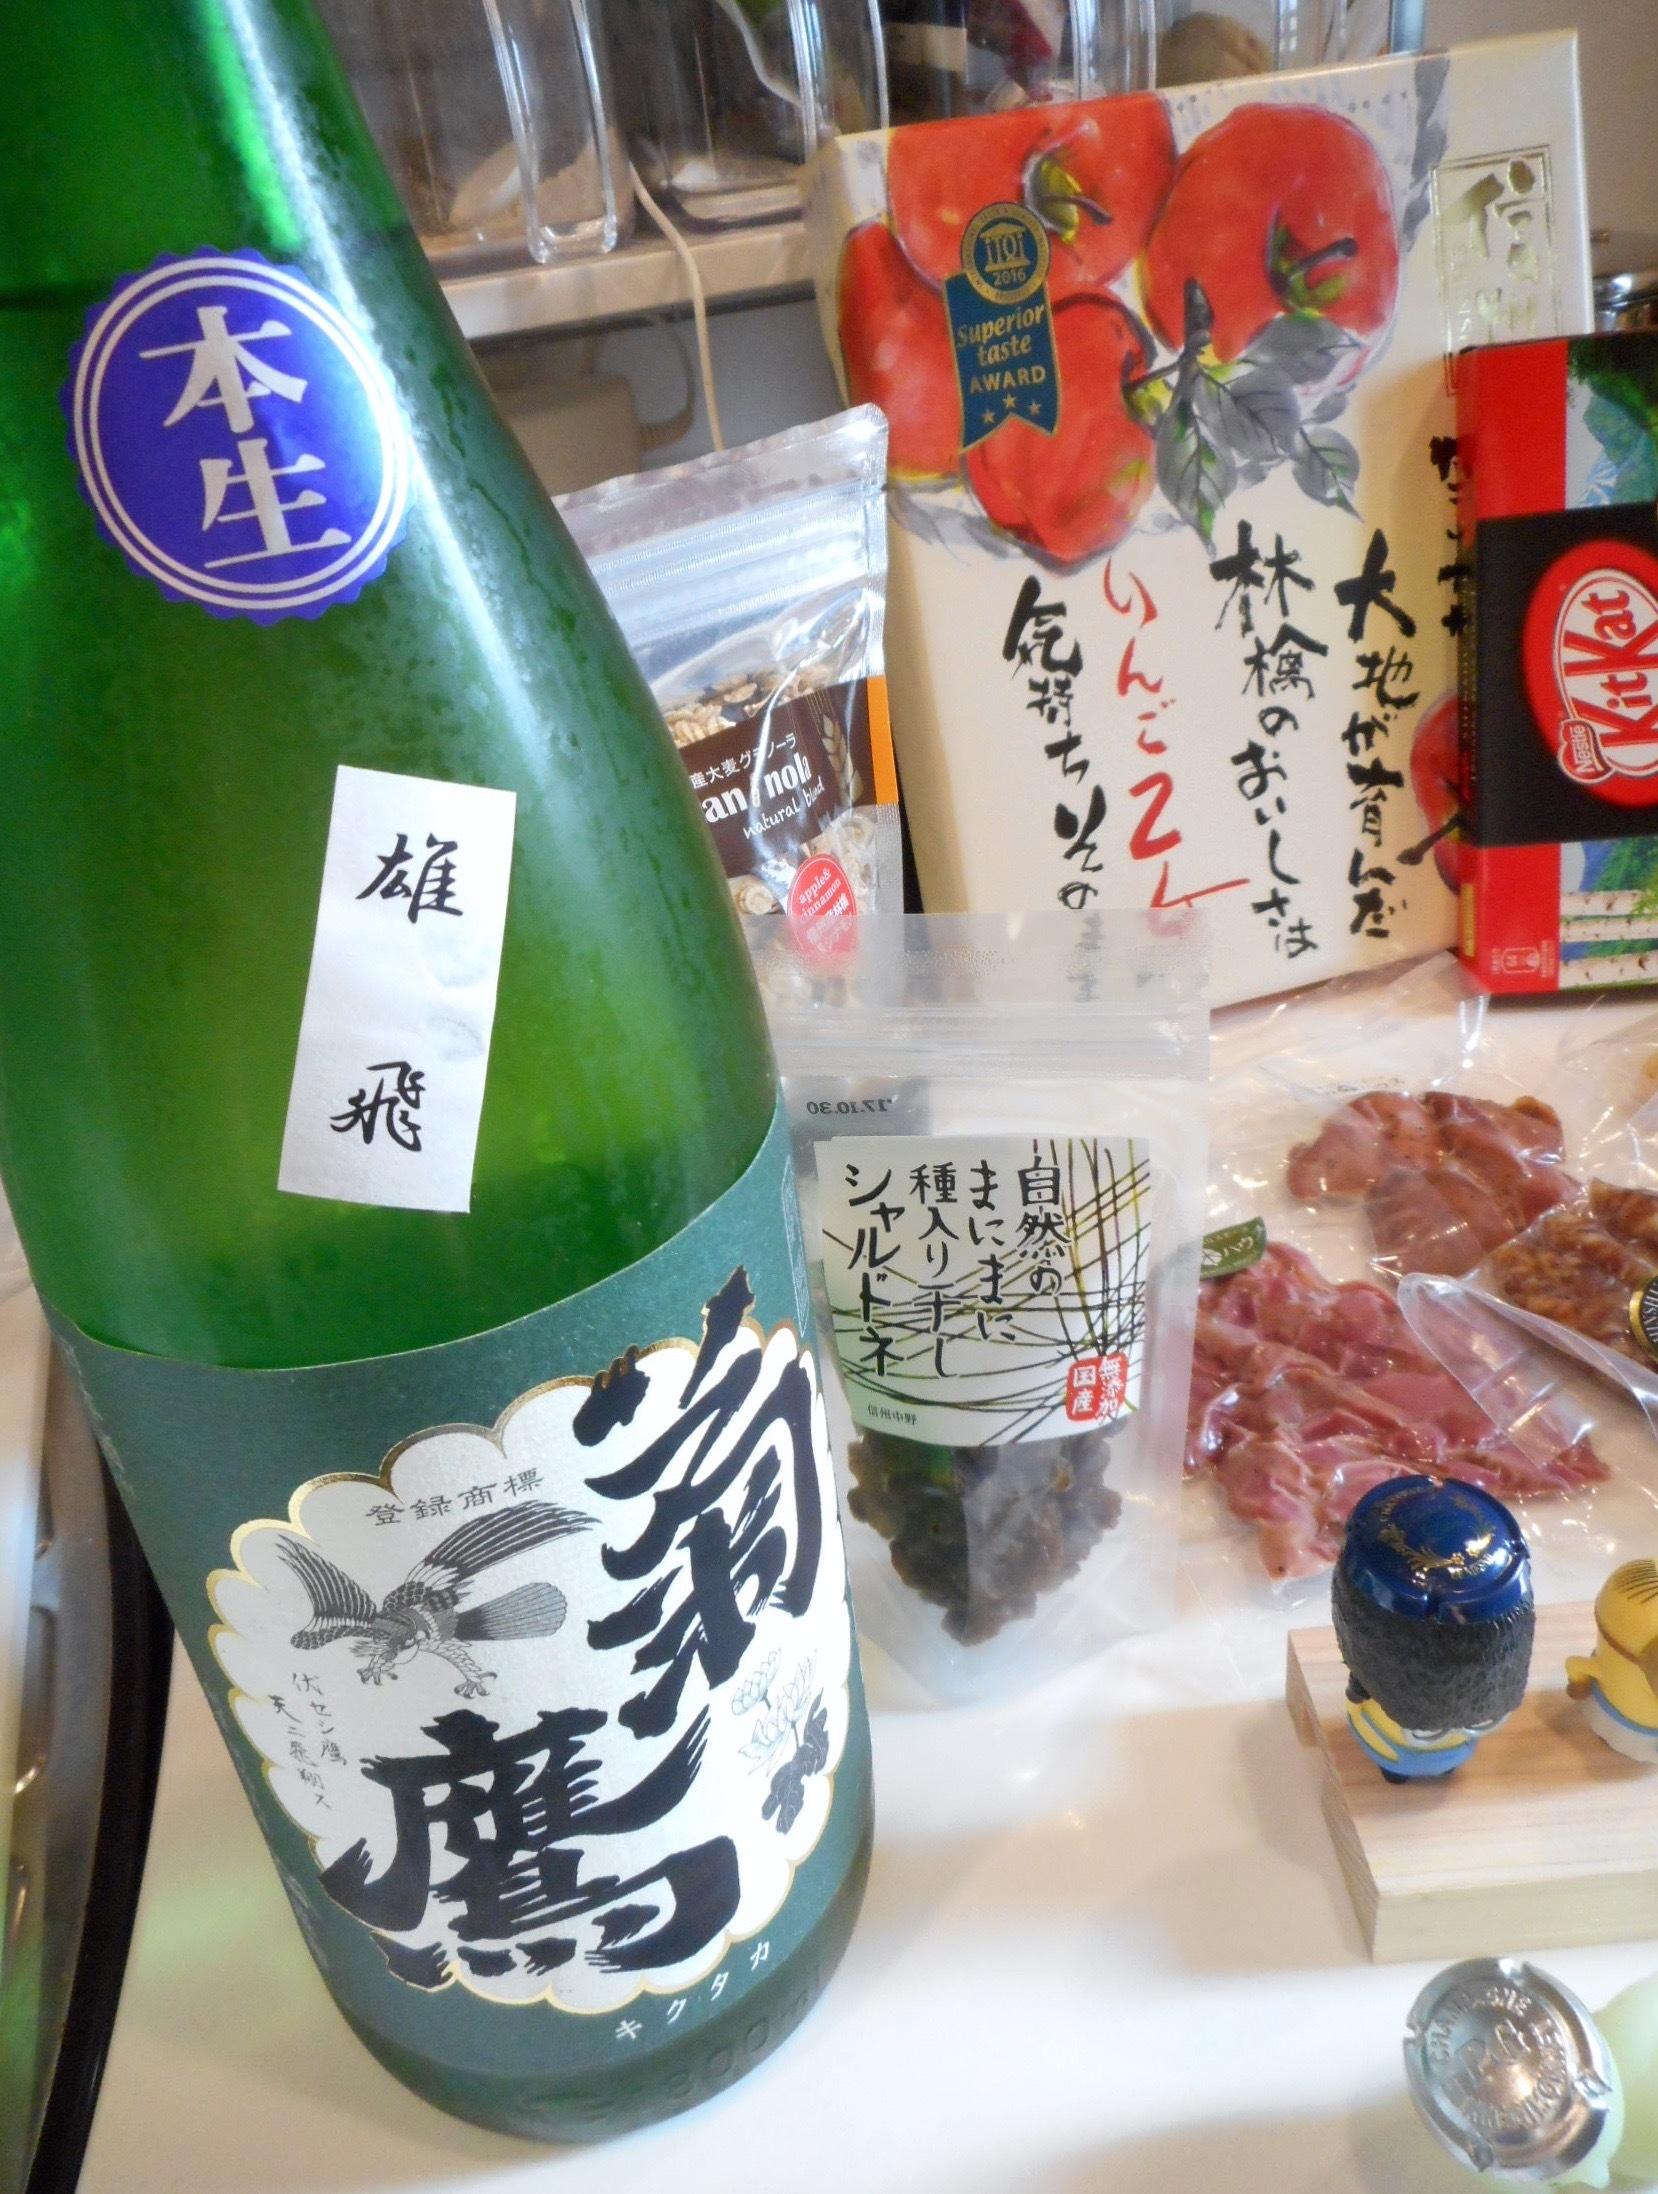 kikutaka_yuuhi_2nen_jukusei3.jpg